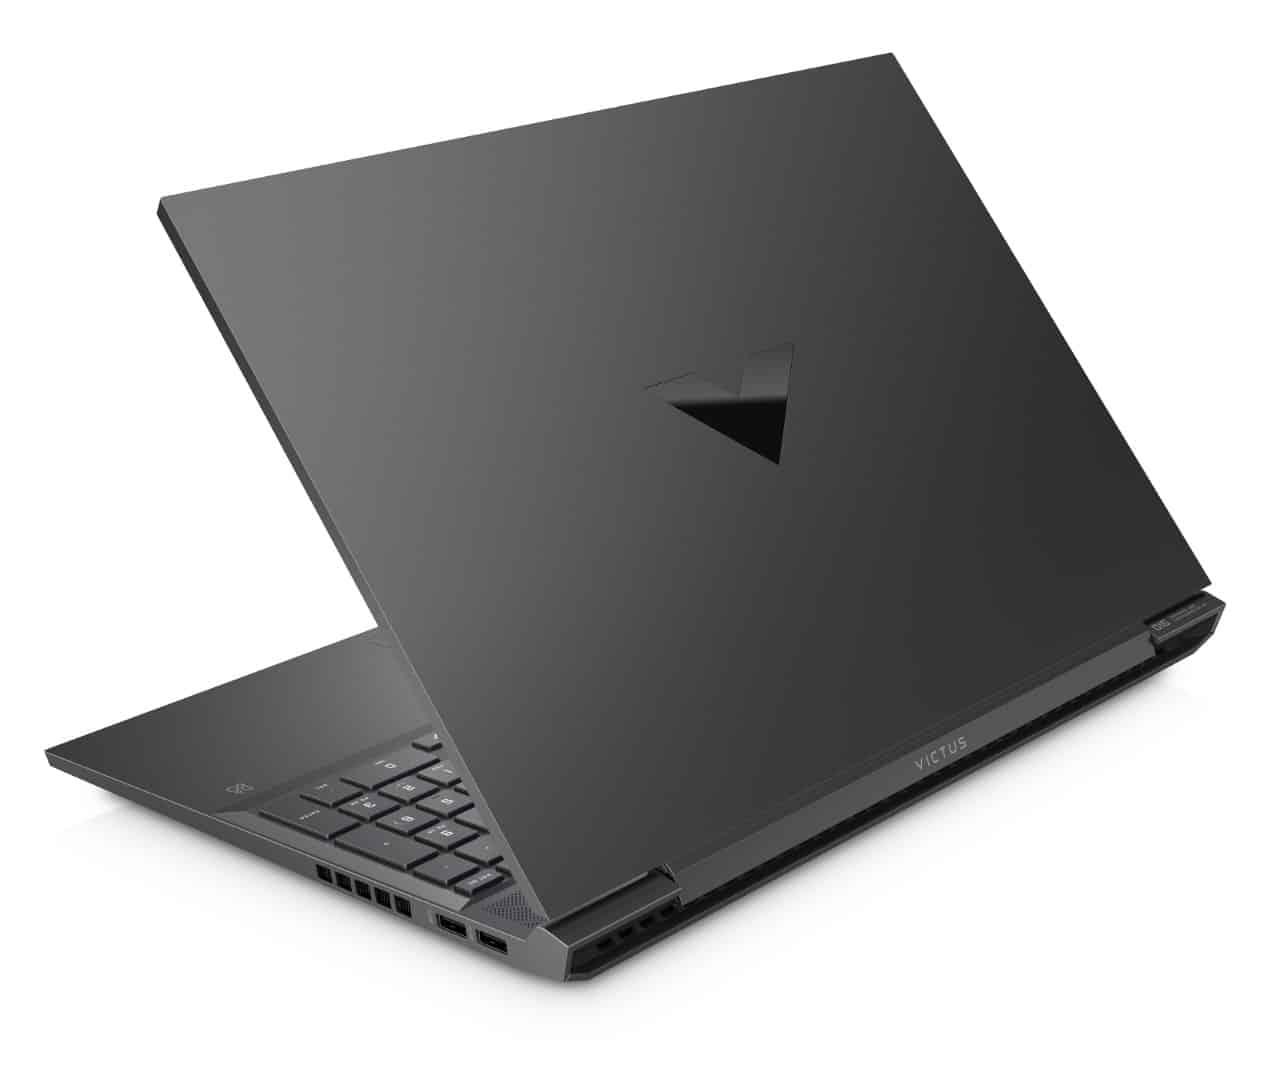 Victus 16L Laptop - Mica Silver - 4 (Large)